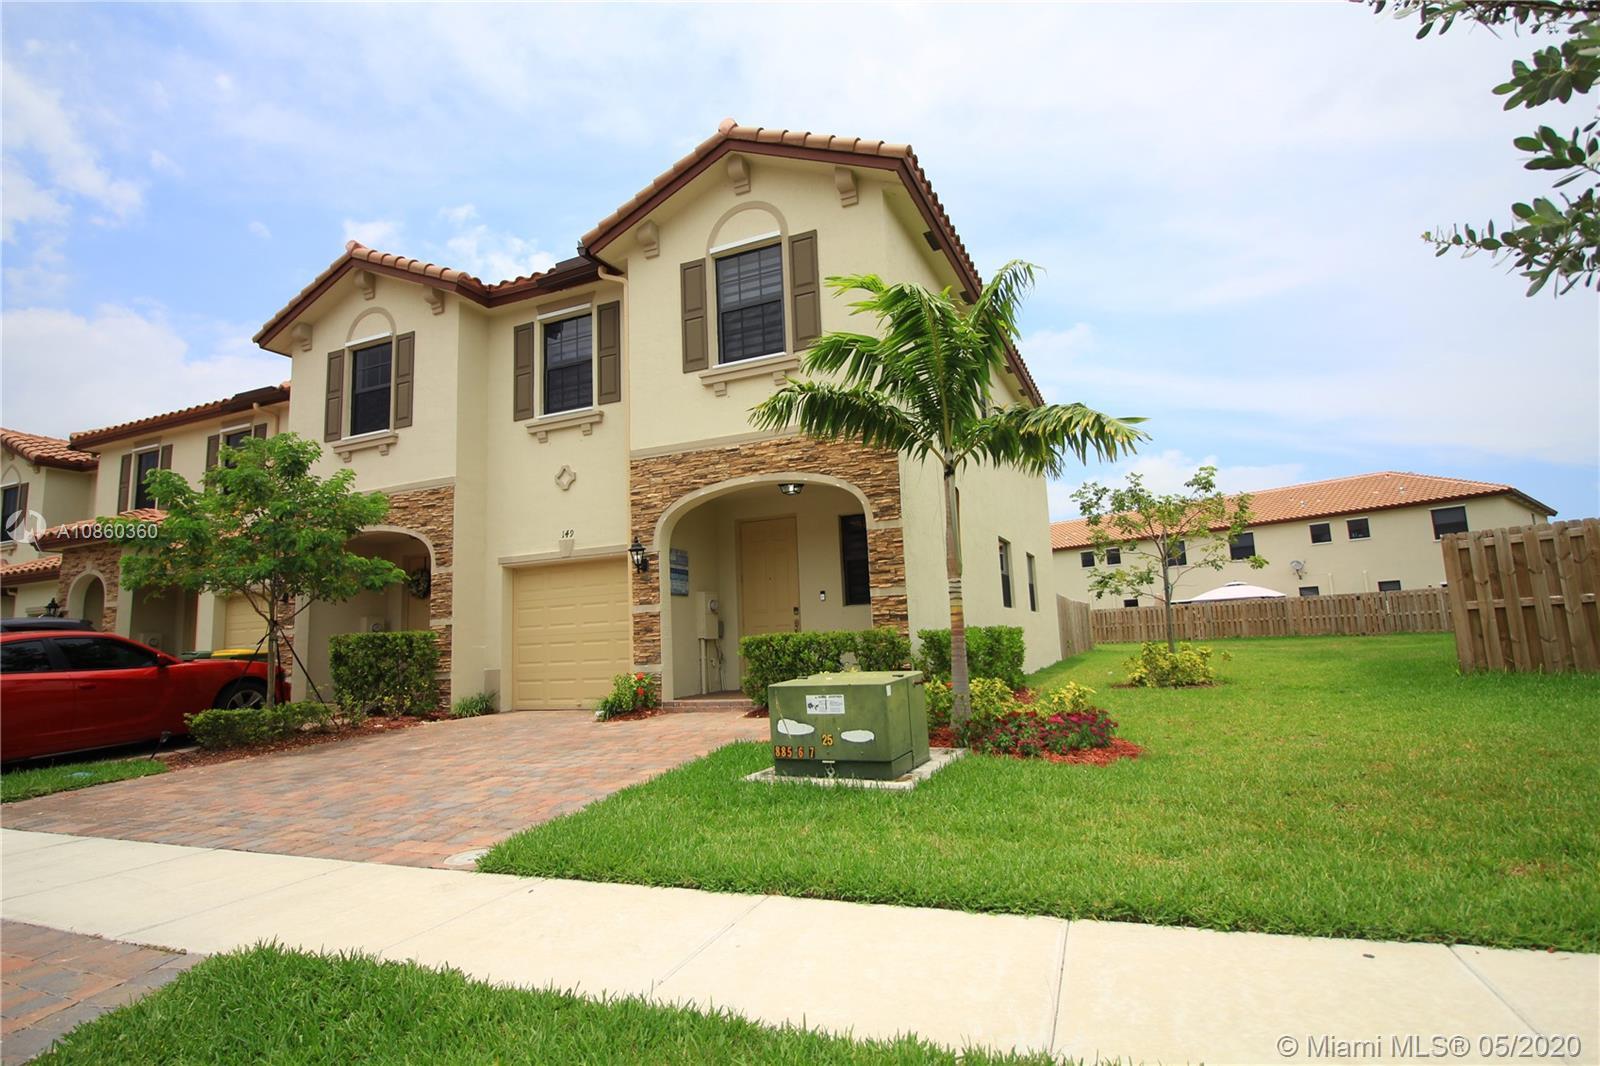 149 SE 37th Ter #149, Homestead, FL 33033 - Homestead, FL real estate listing